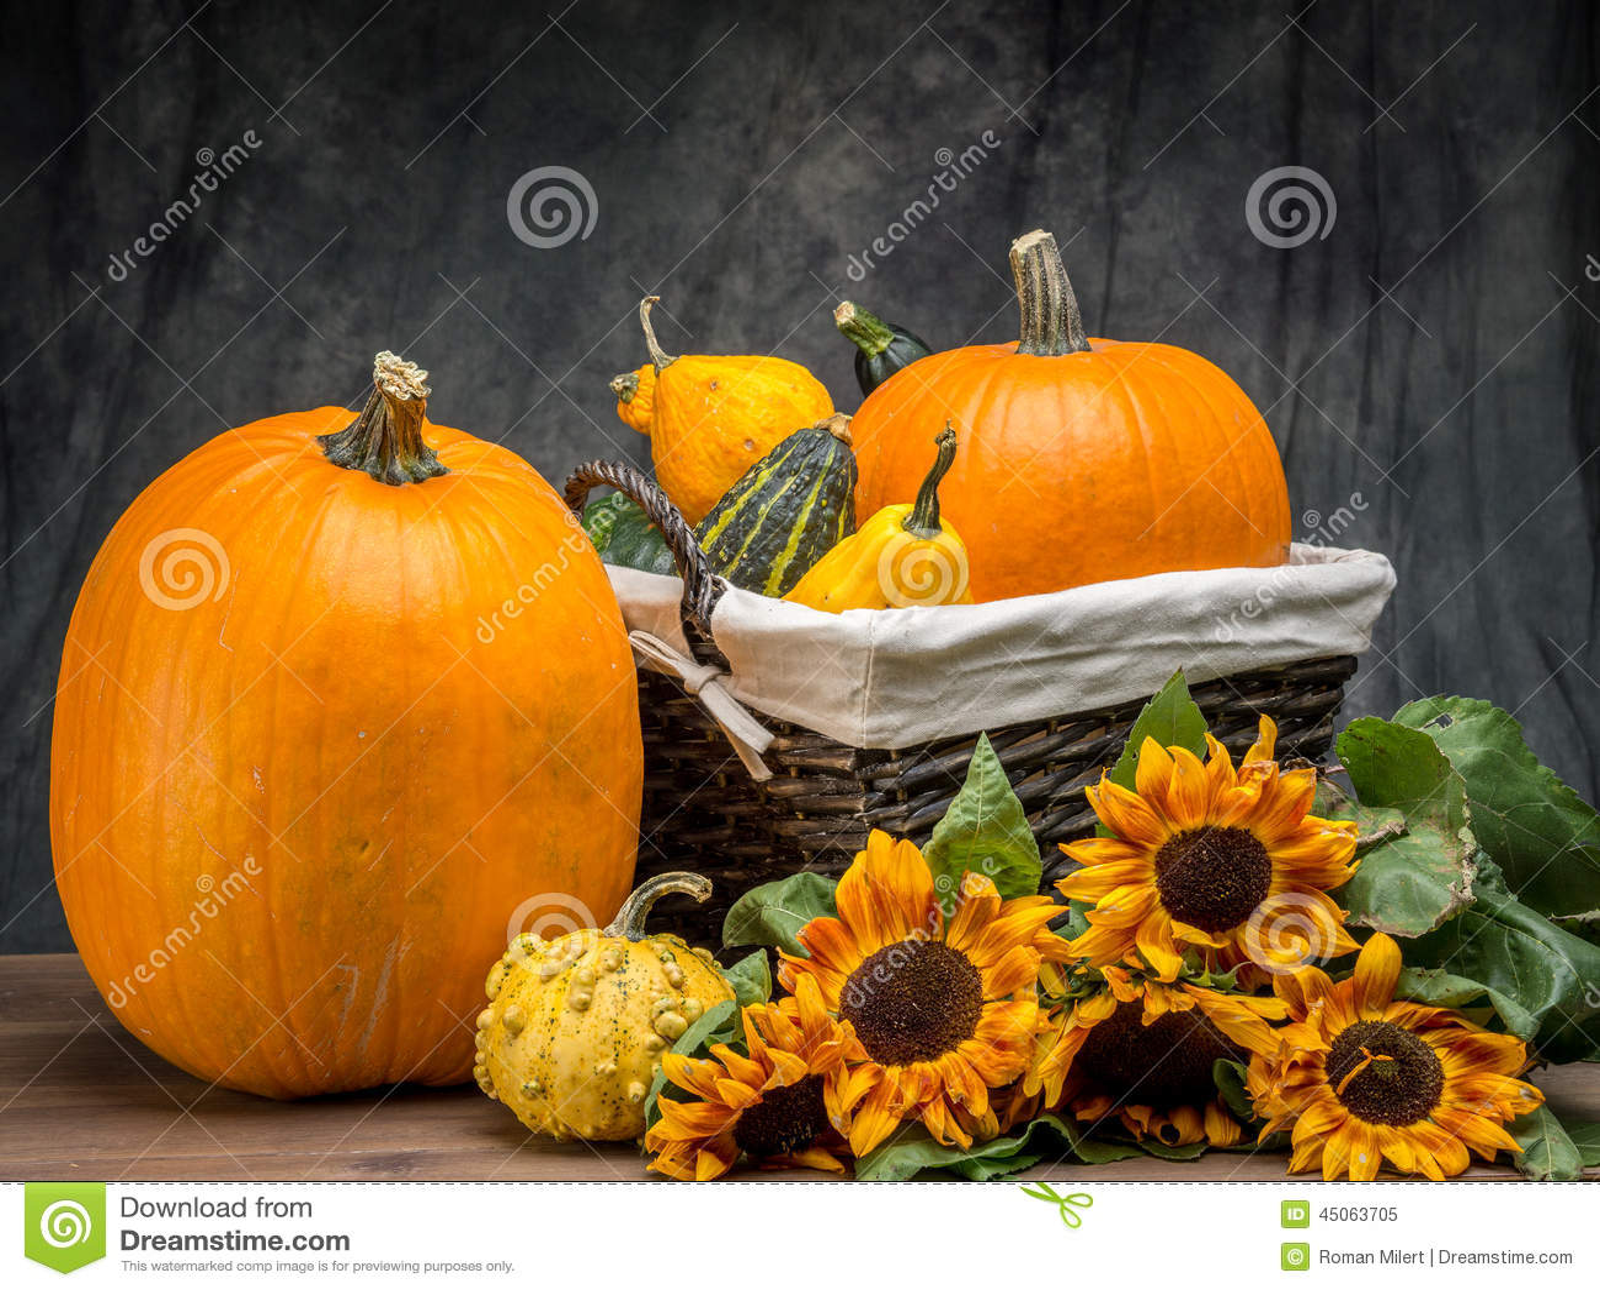 Autumn crops